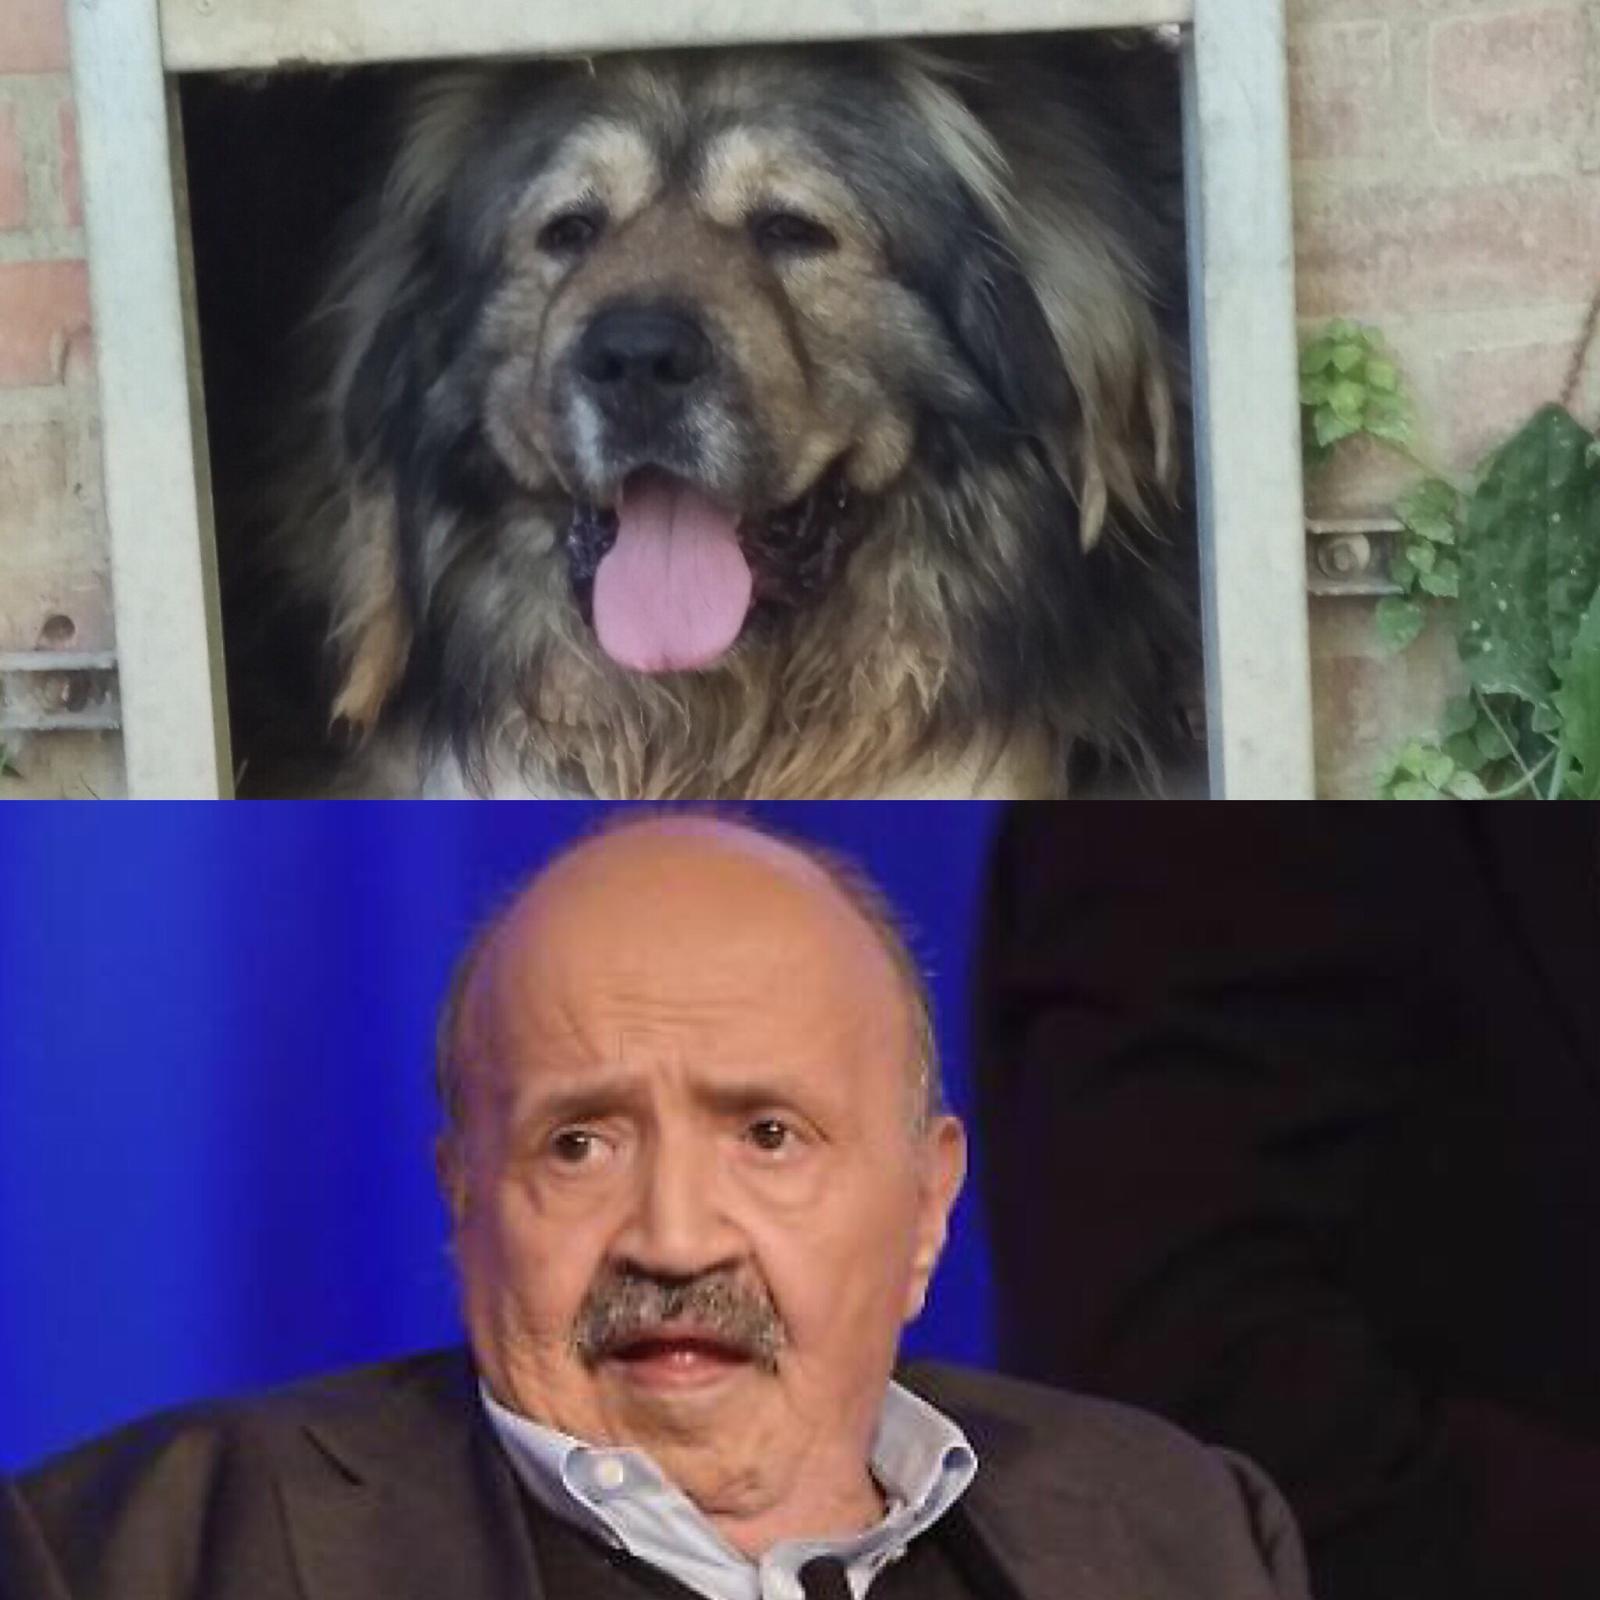 Cani E Gatti Uguali Ai Personaggi Famosi Adottateli